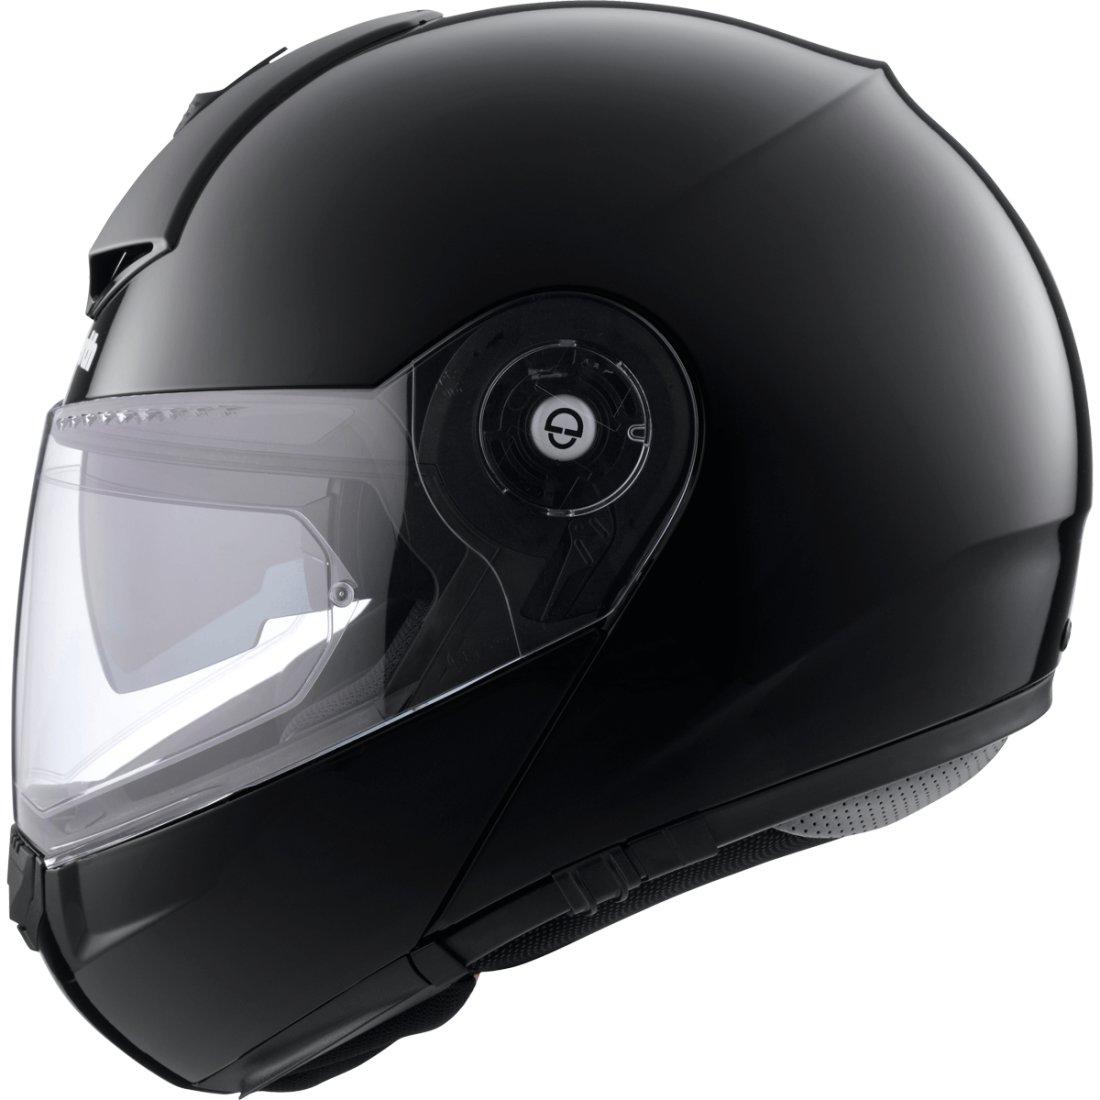 schuberth c3 pro glossy black helmet motocard. Black Bedroom Furniture Sets. Home Design Ideas